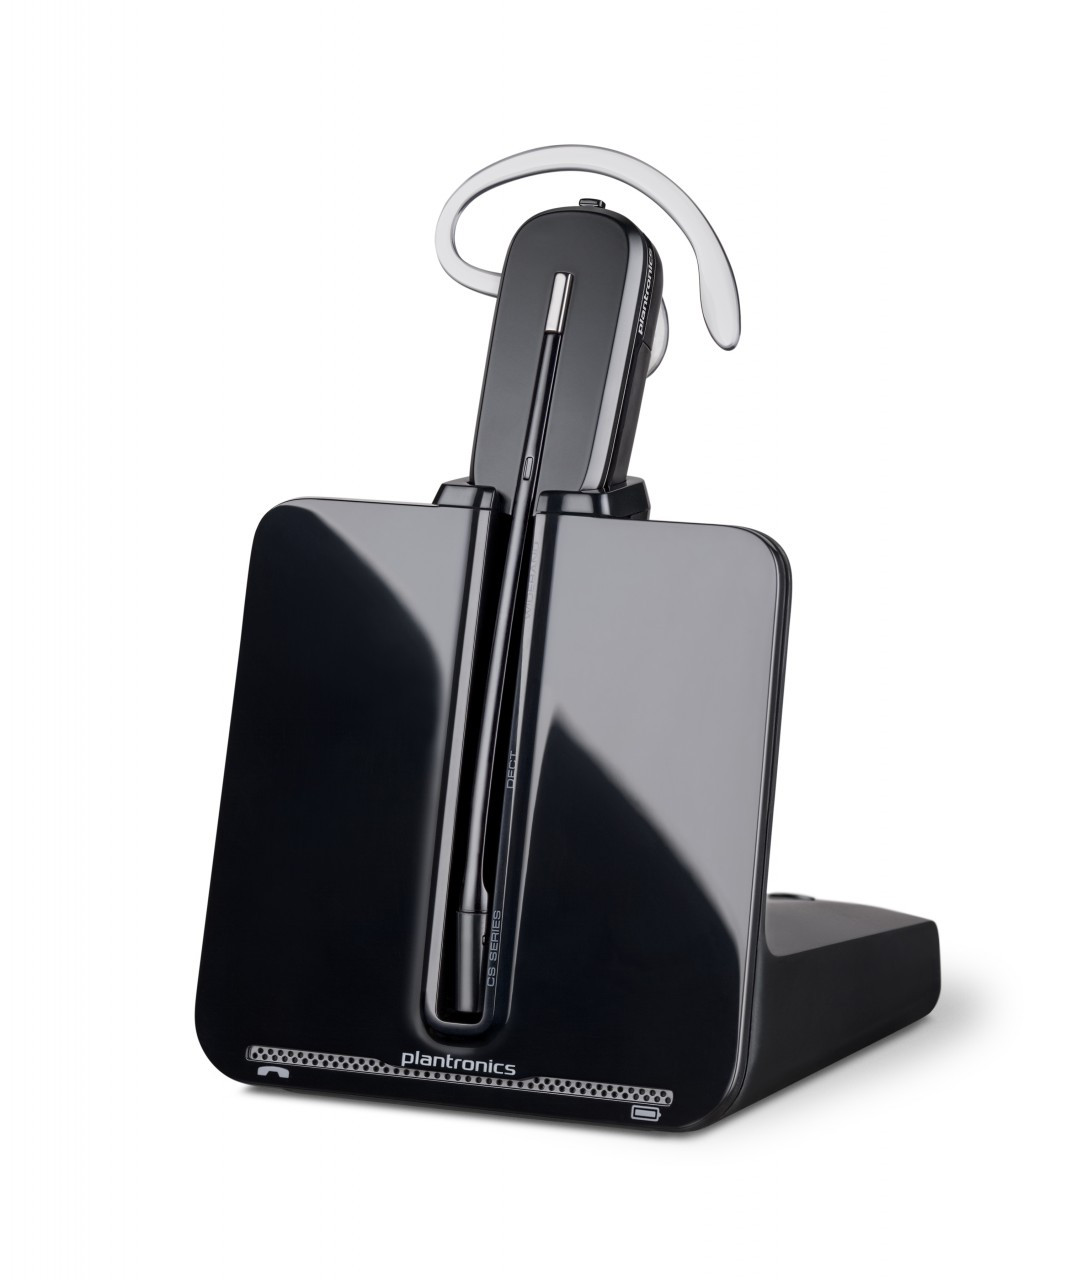 Plantronics Cs 540 Wireless Headset Convertible 84693 01 Voip Digital And Analog Phone Compatible Cs540 Wireless 520 Dect Plantronics Wireless Cs540 Headset